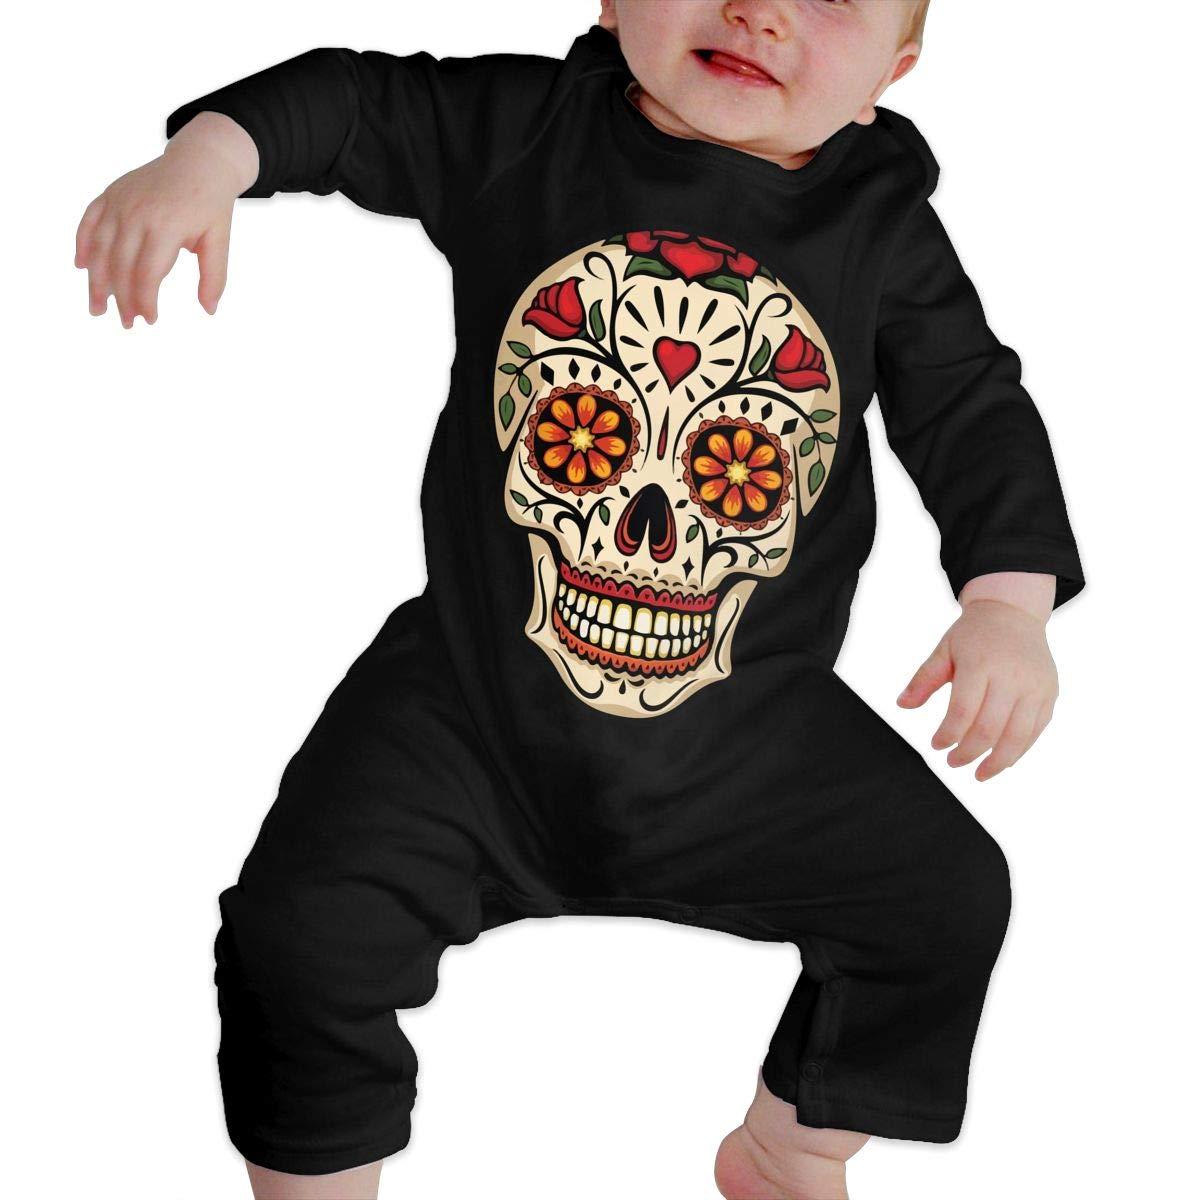 LBJQ8 Mexican Skull Baby Infant Girls Organic Cotton Romper Jumpsuit